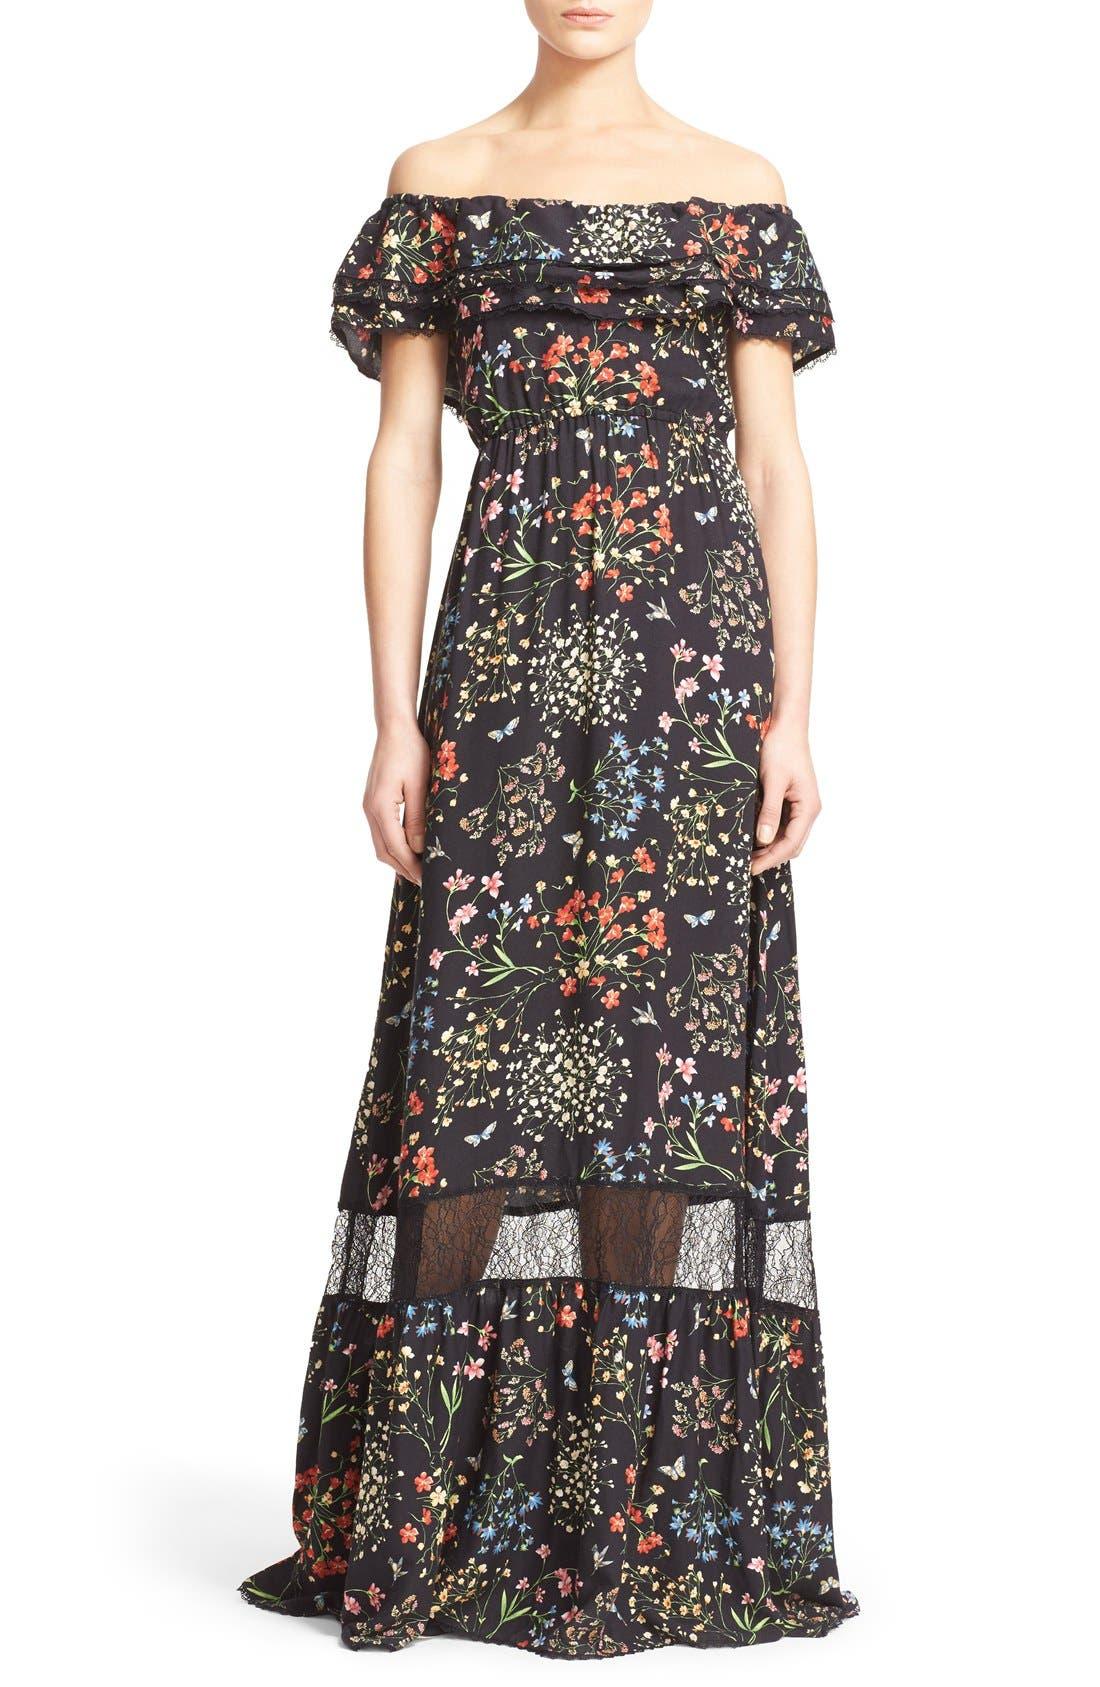 'Cheri' Floral Print Off the Shoulder Maxi Dress,                             Main thumbnail 1, color,                             002